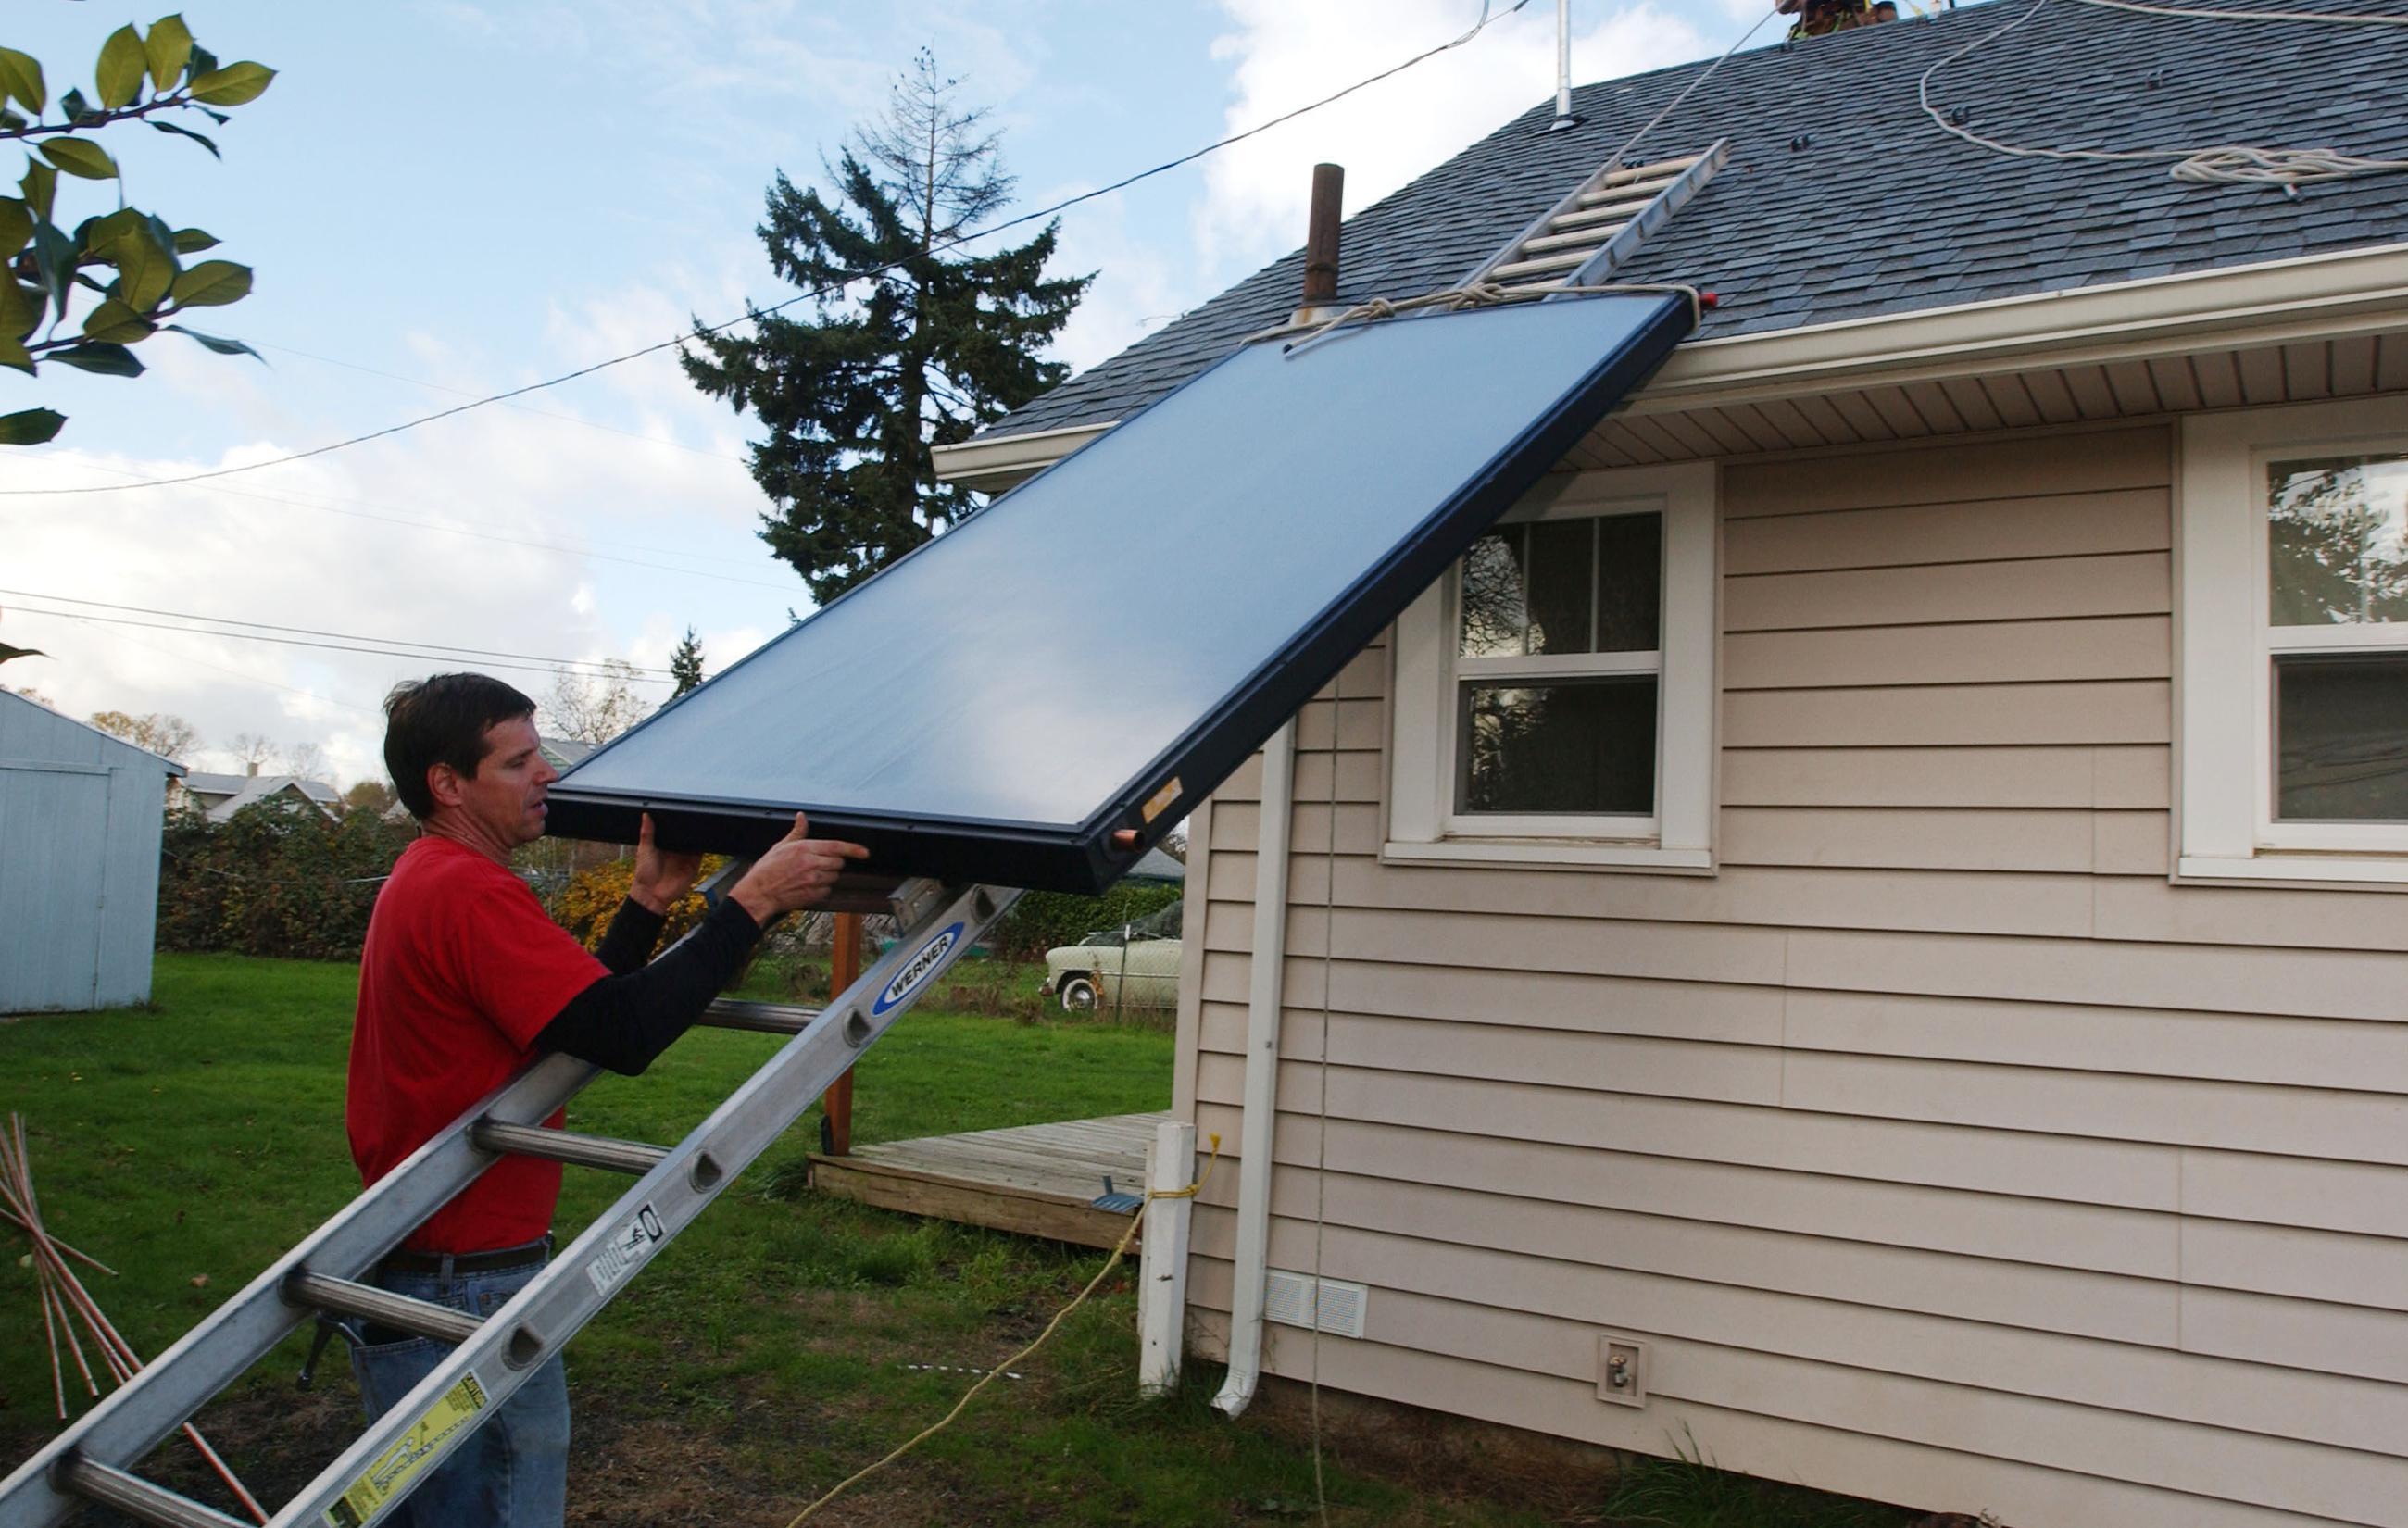 Solar Industry, Utilities Seek Common Ground